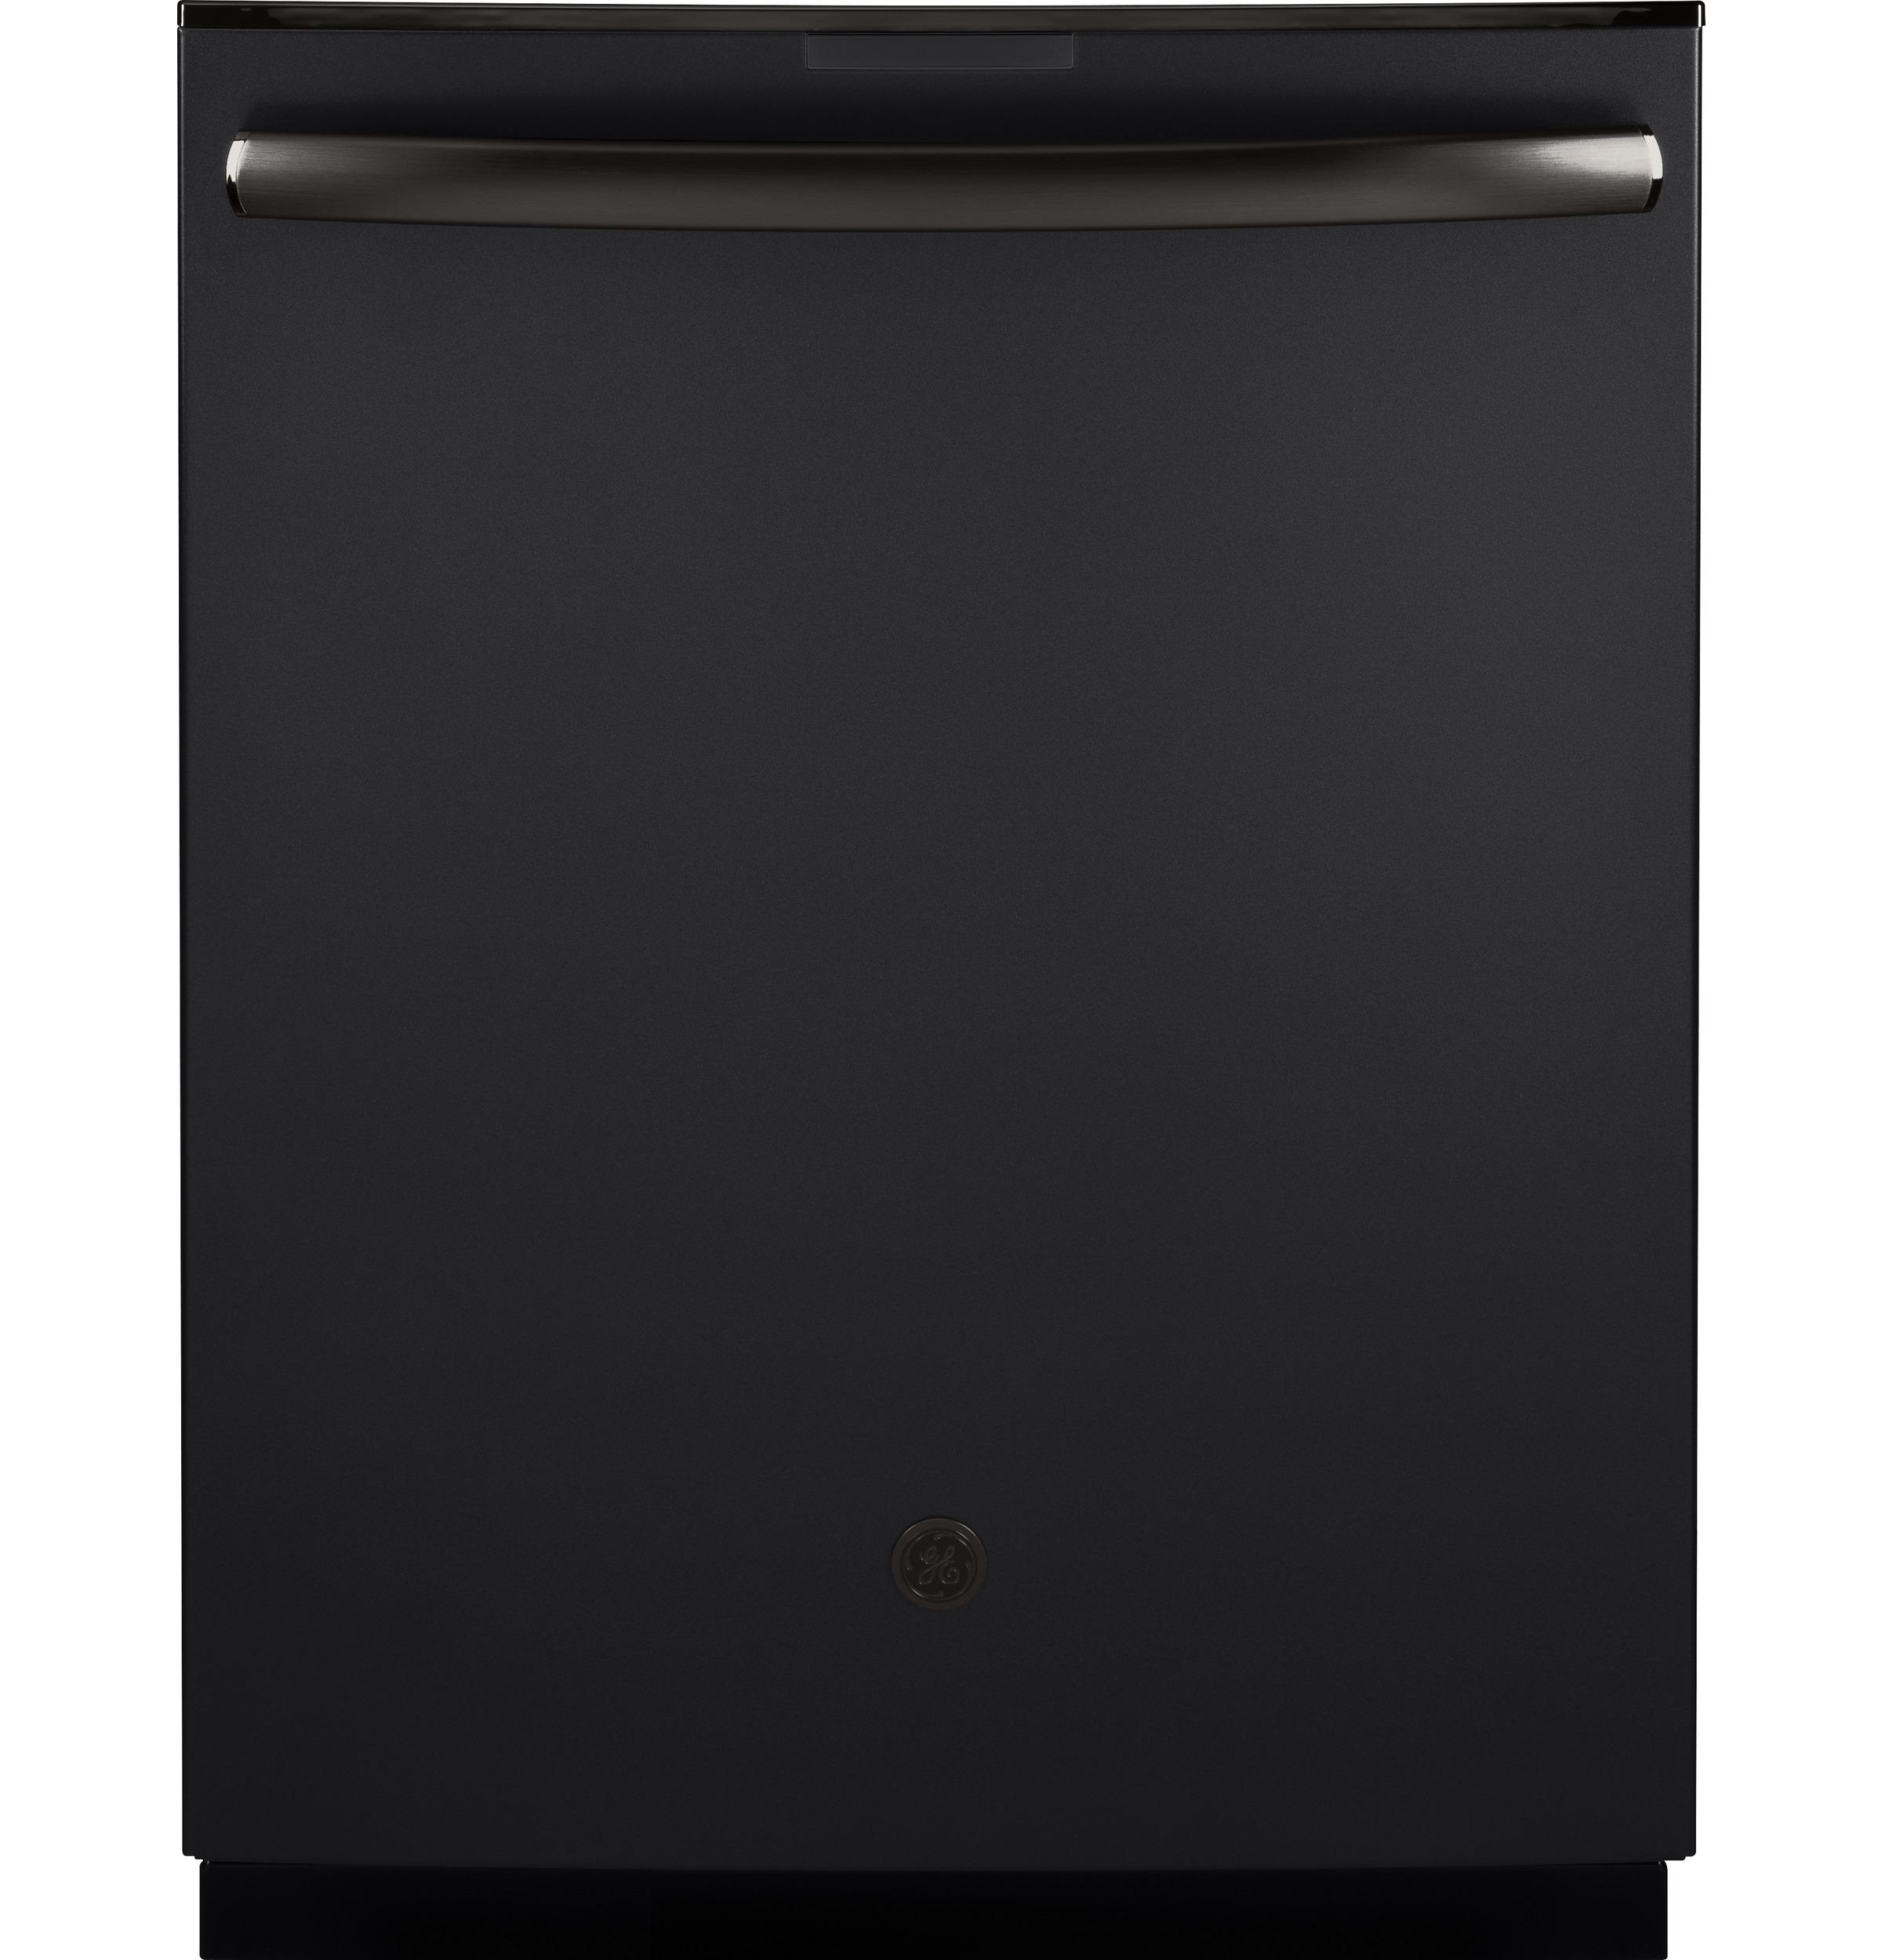 "Image of ""GE Profile Series PDT845SFLDS 24"""" Built-In Dishwasher with Hidden Controls - Black Slate, Black Slate"""